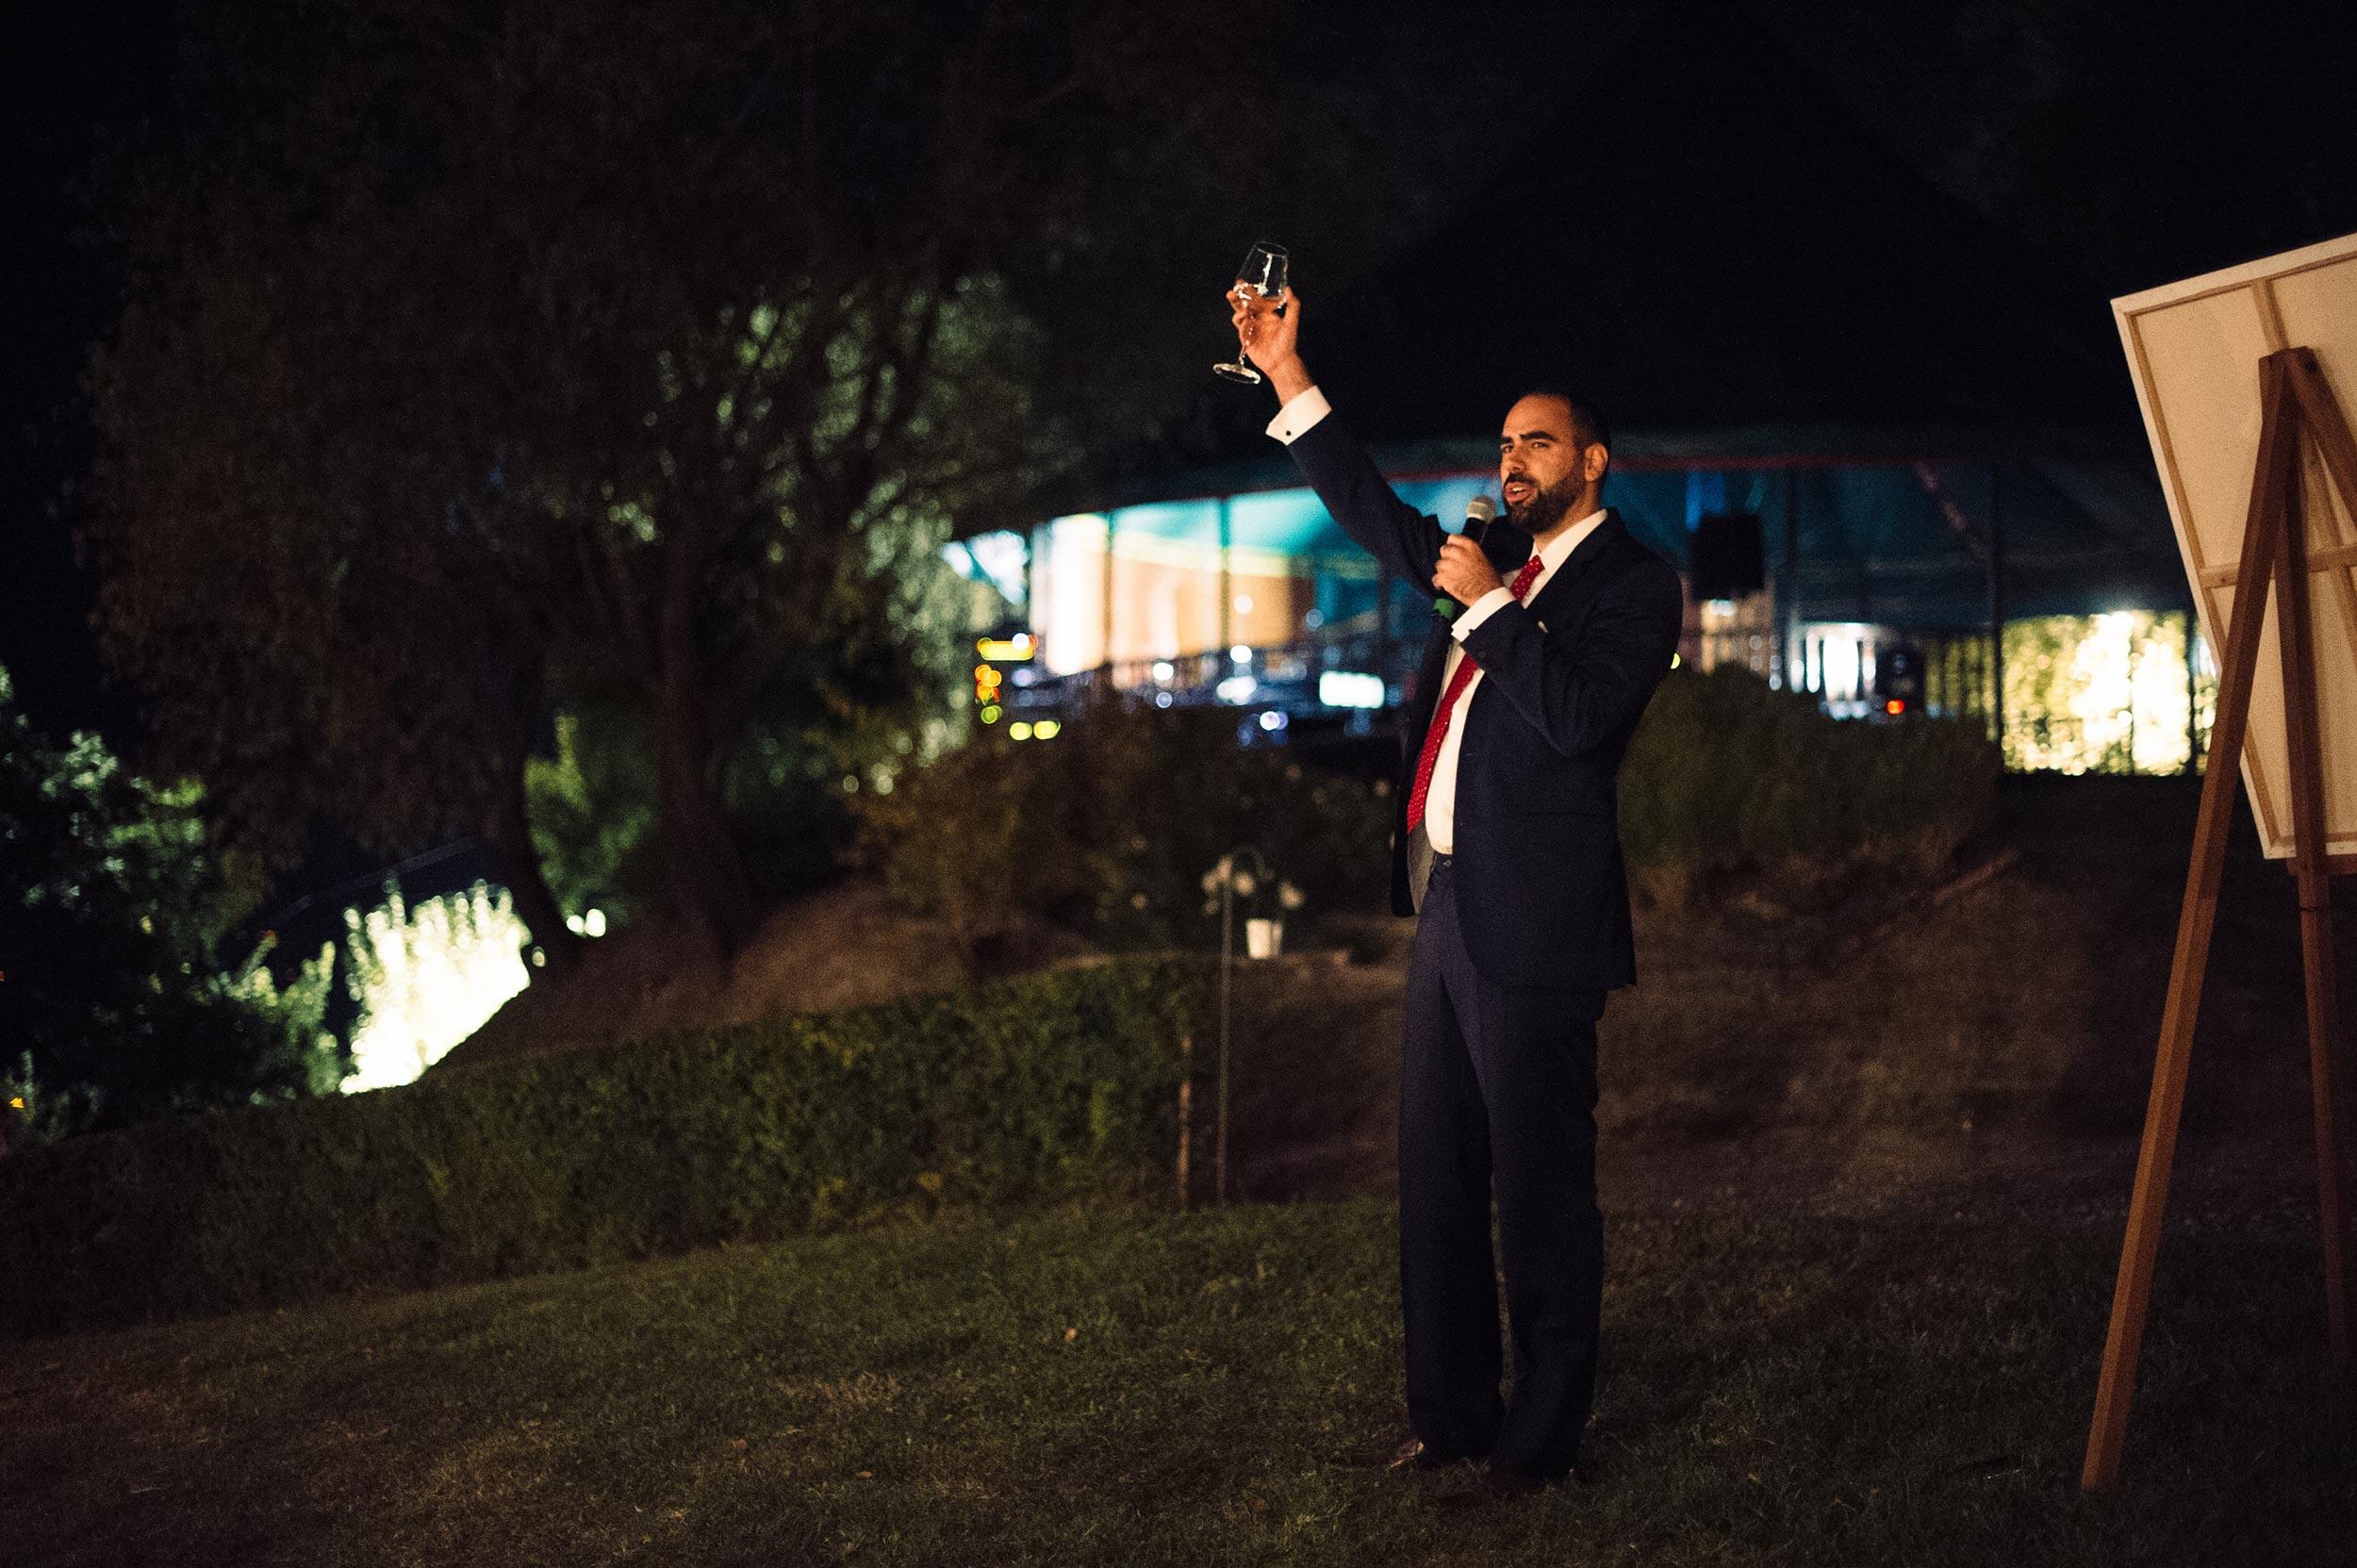 2016-Davor-Chiara-Monferrato-Asti-Vercelli-Wedding-Photographer-Italy-Alessandro-Avenali-83.jpg